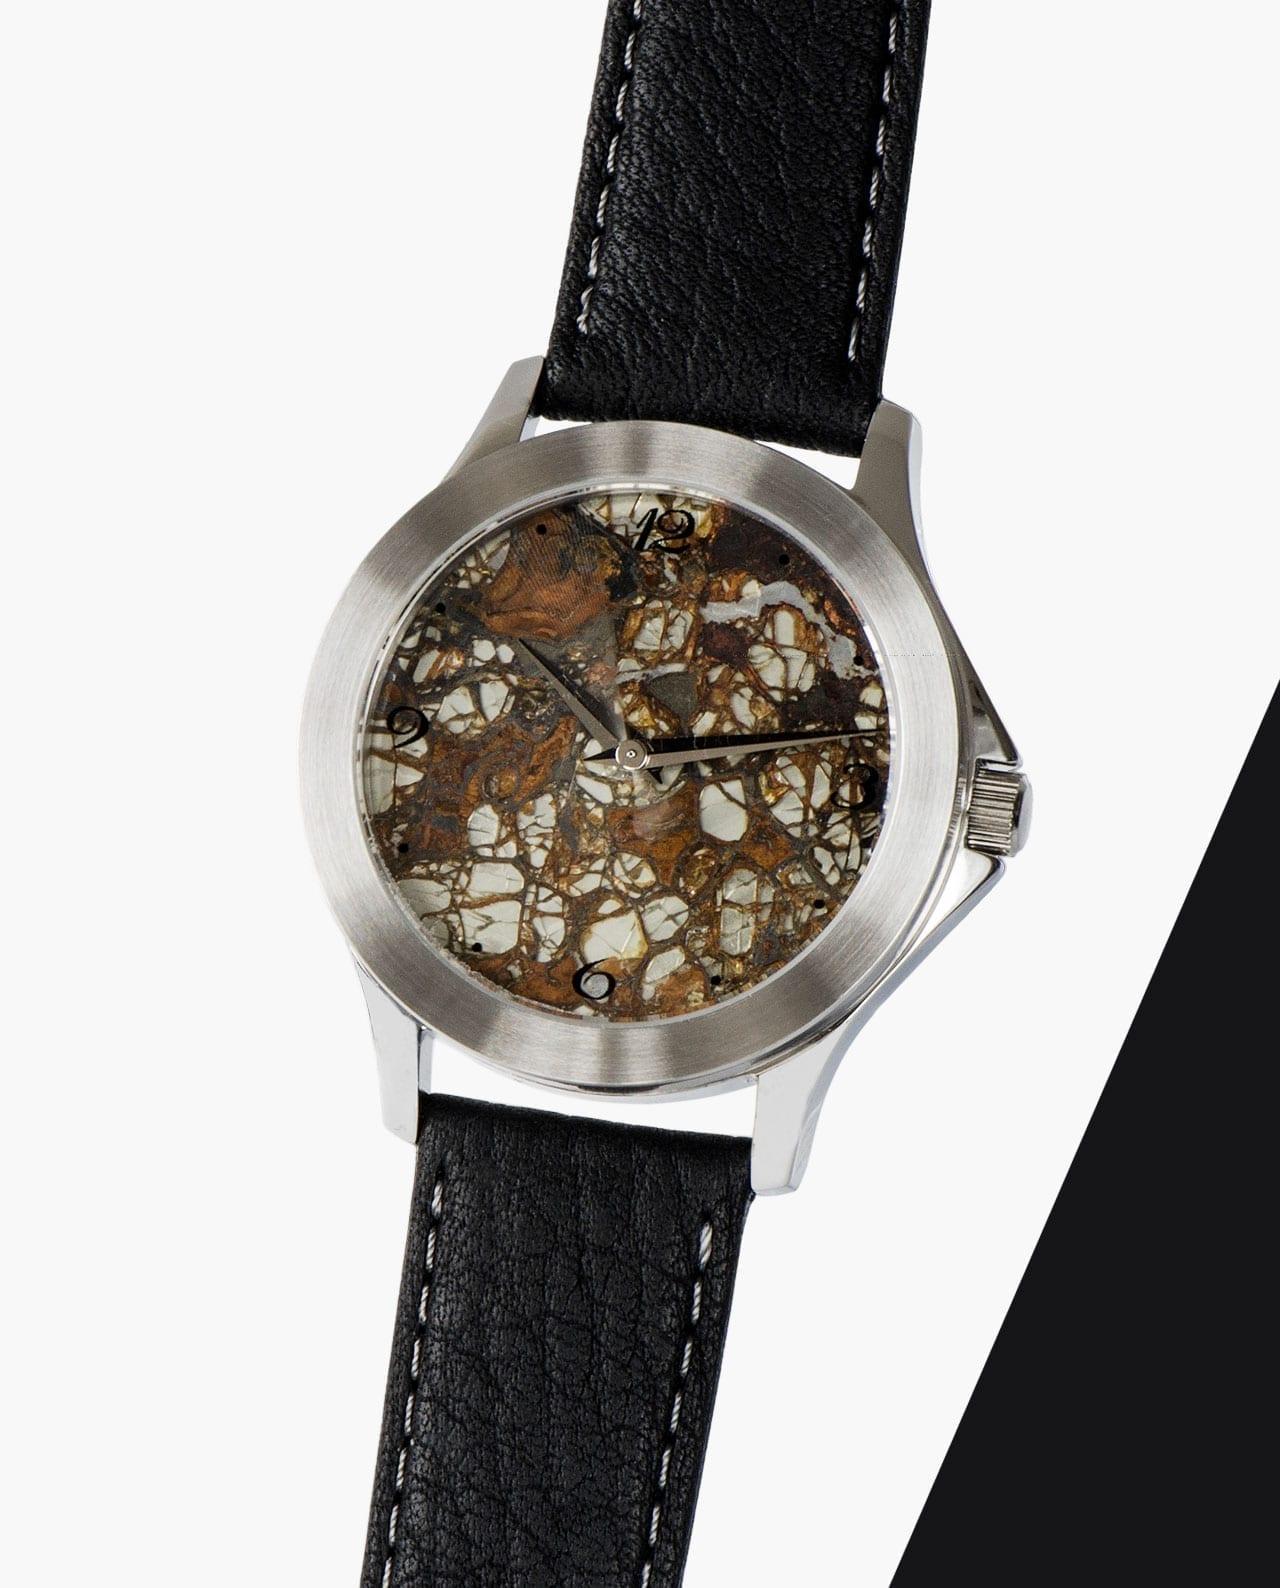 CONLIGHT-PALLAS Meteorite watch Jepara Pallasit